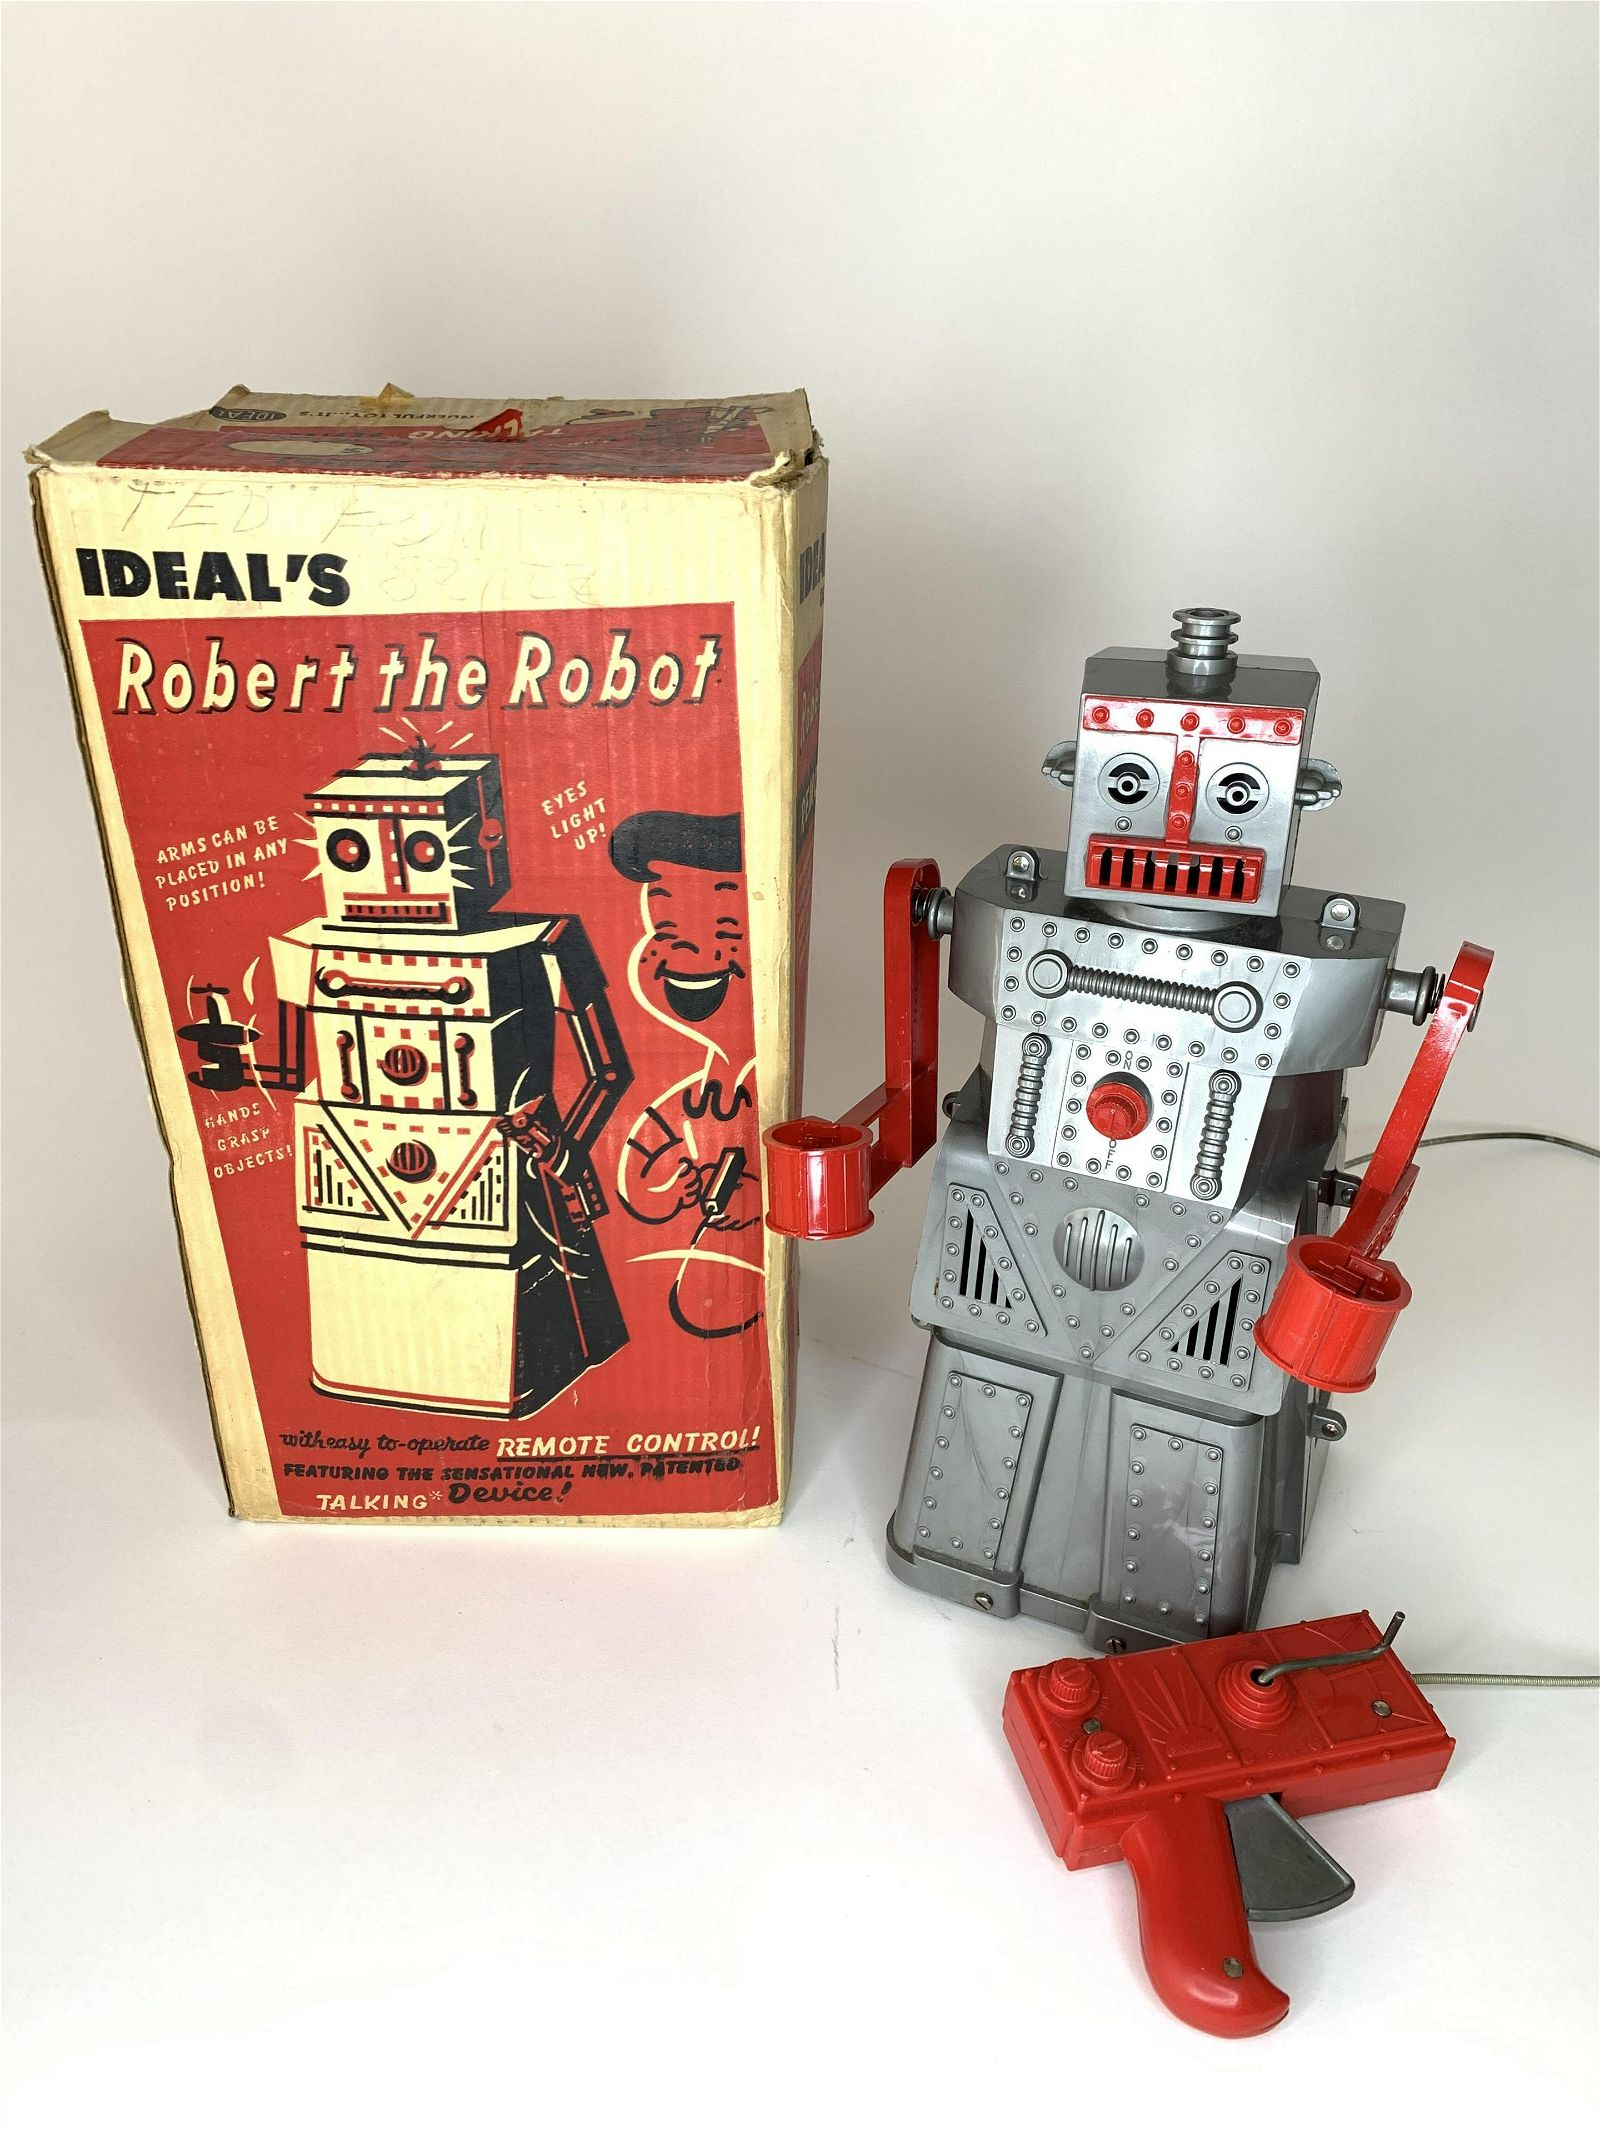 Robert the Robot Ideal Toy